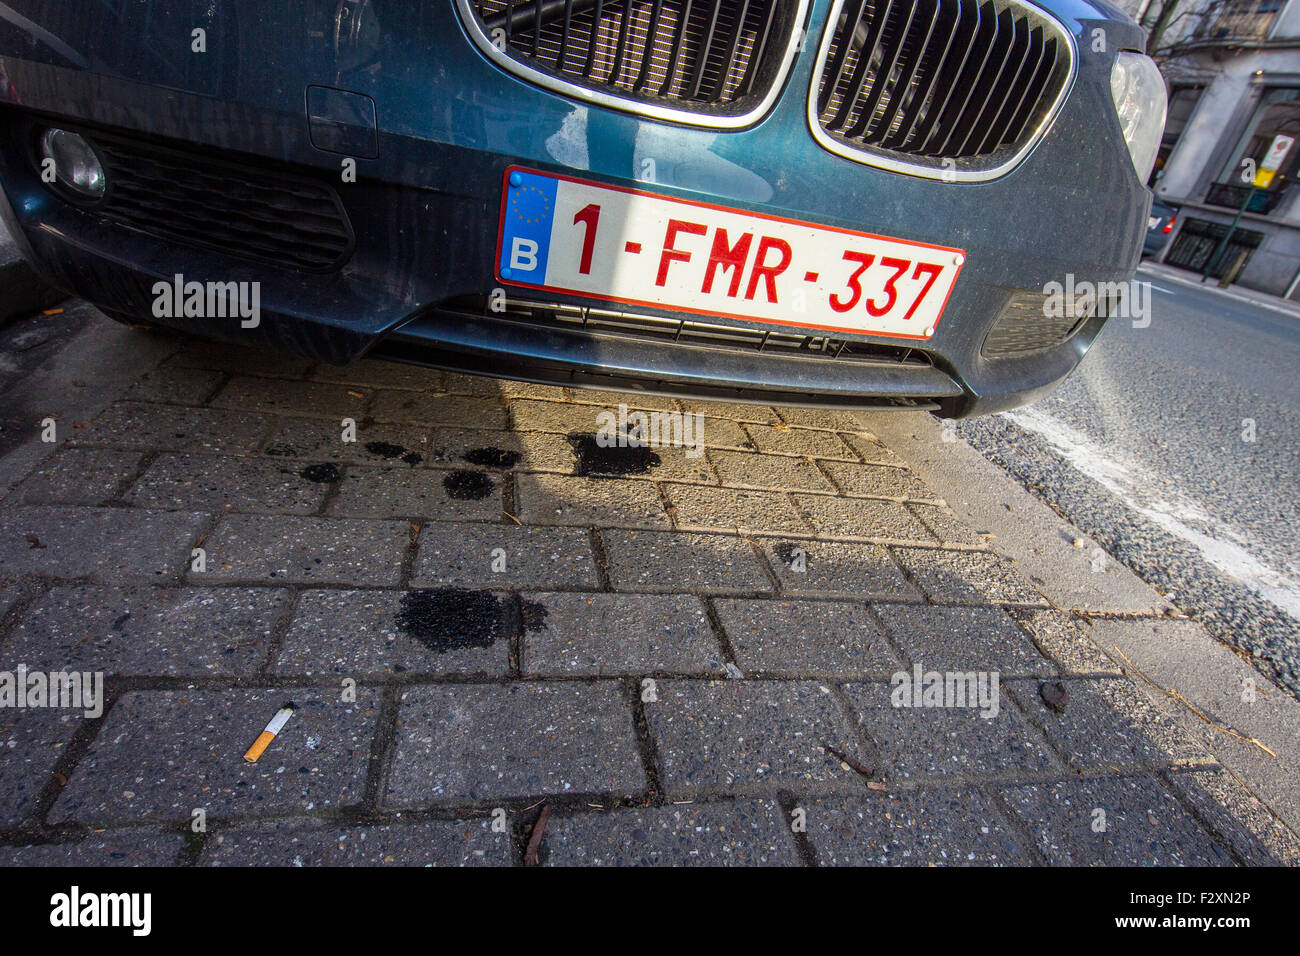 Öl-Leck Tropf Auto Fahrzeug Straßenpflaster Bürgersteig Stockbild